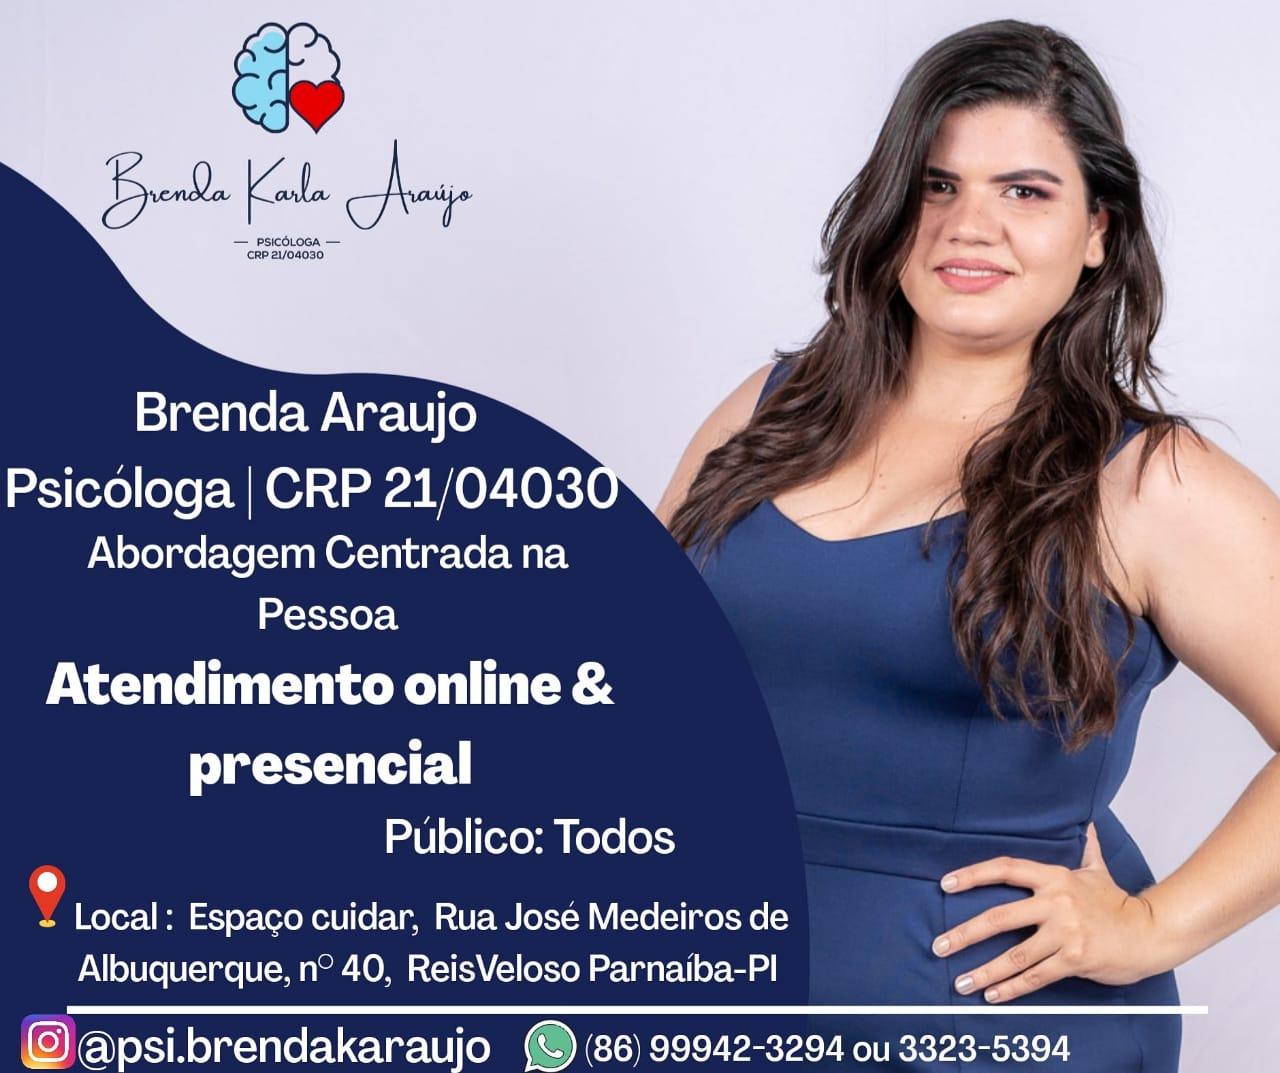 Brenda Araujo - Psicóloga